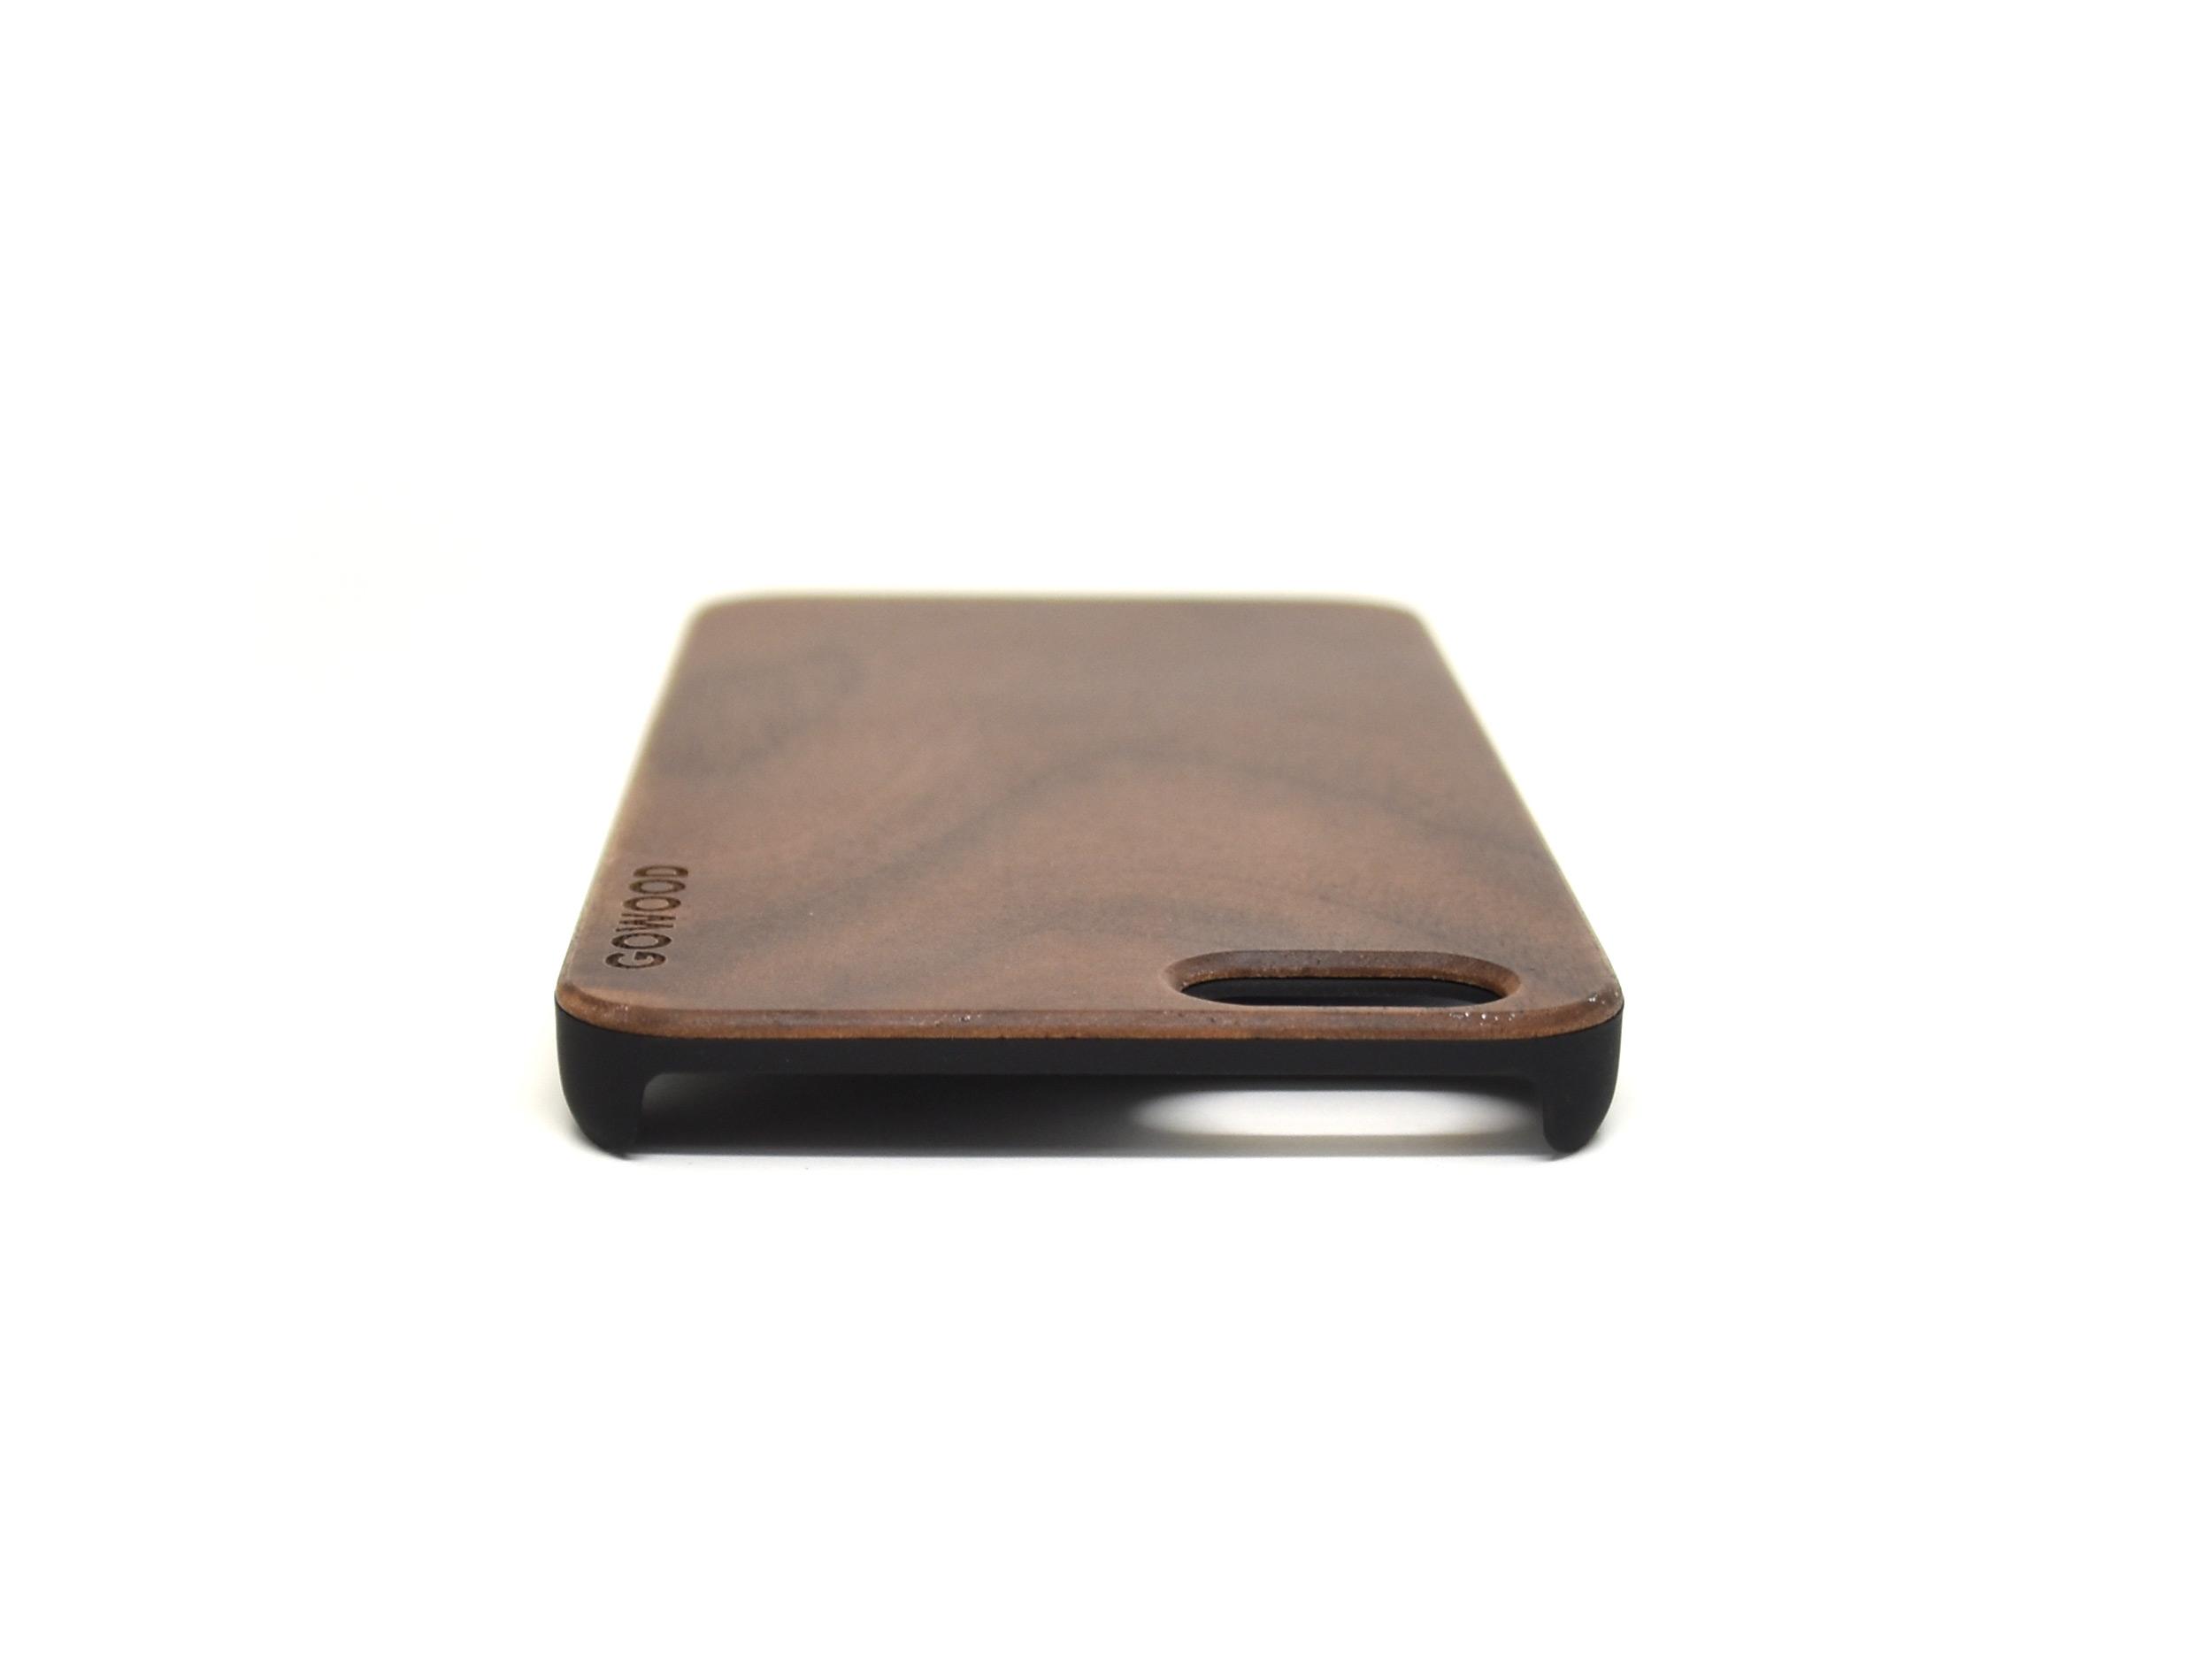 iPhone 6 case walnut wood top